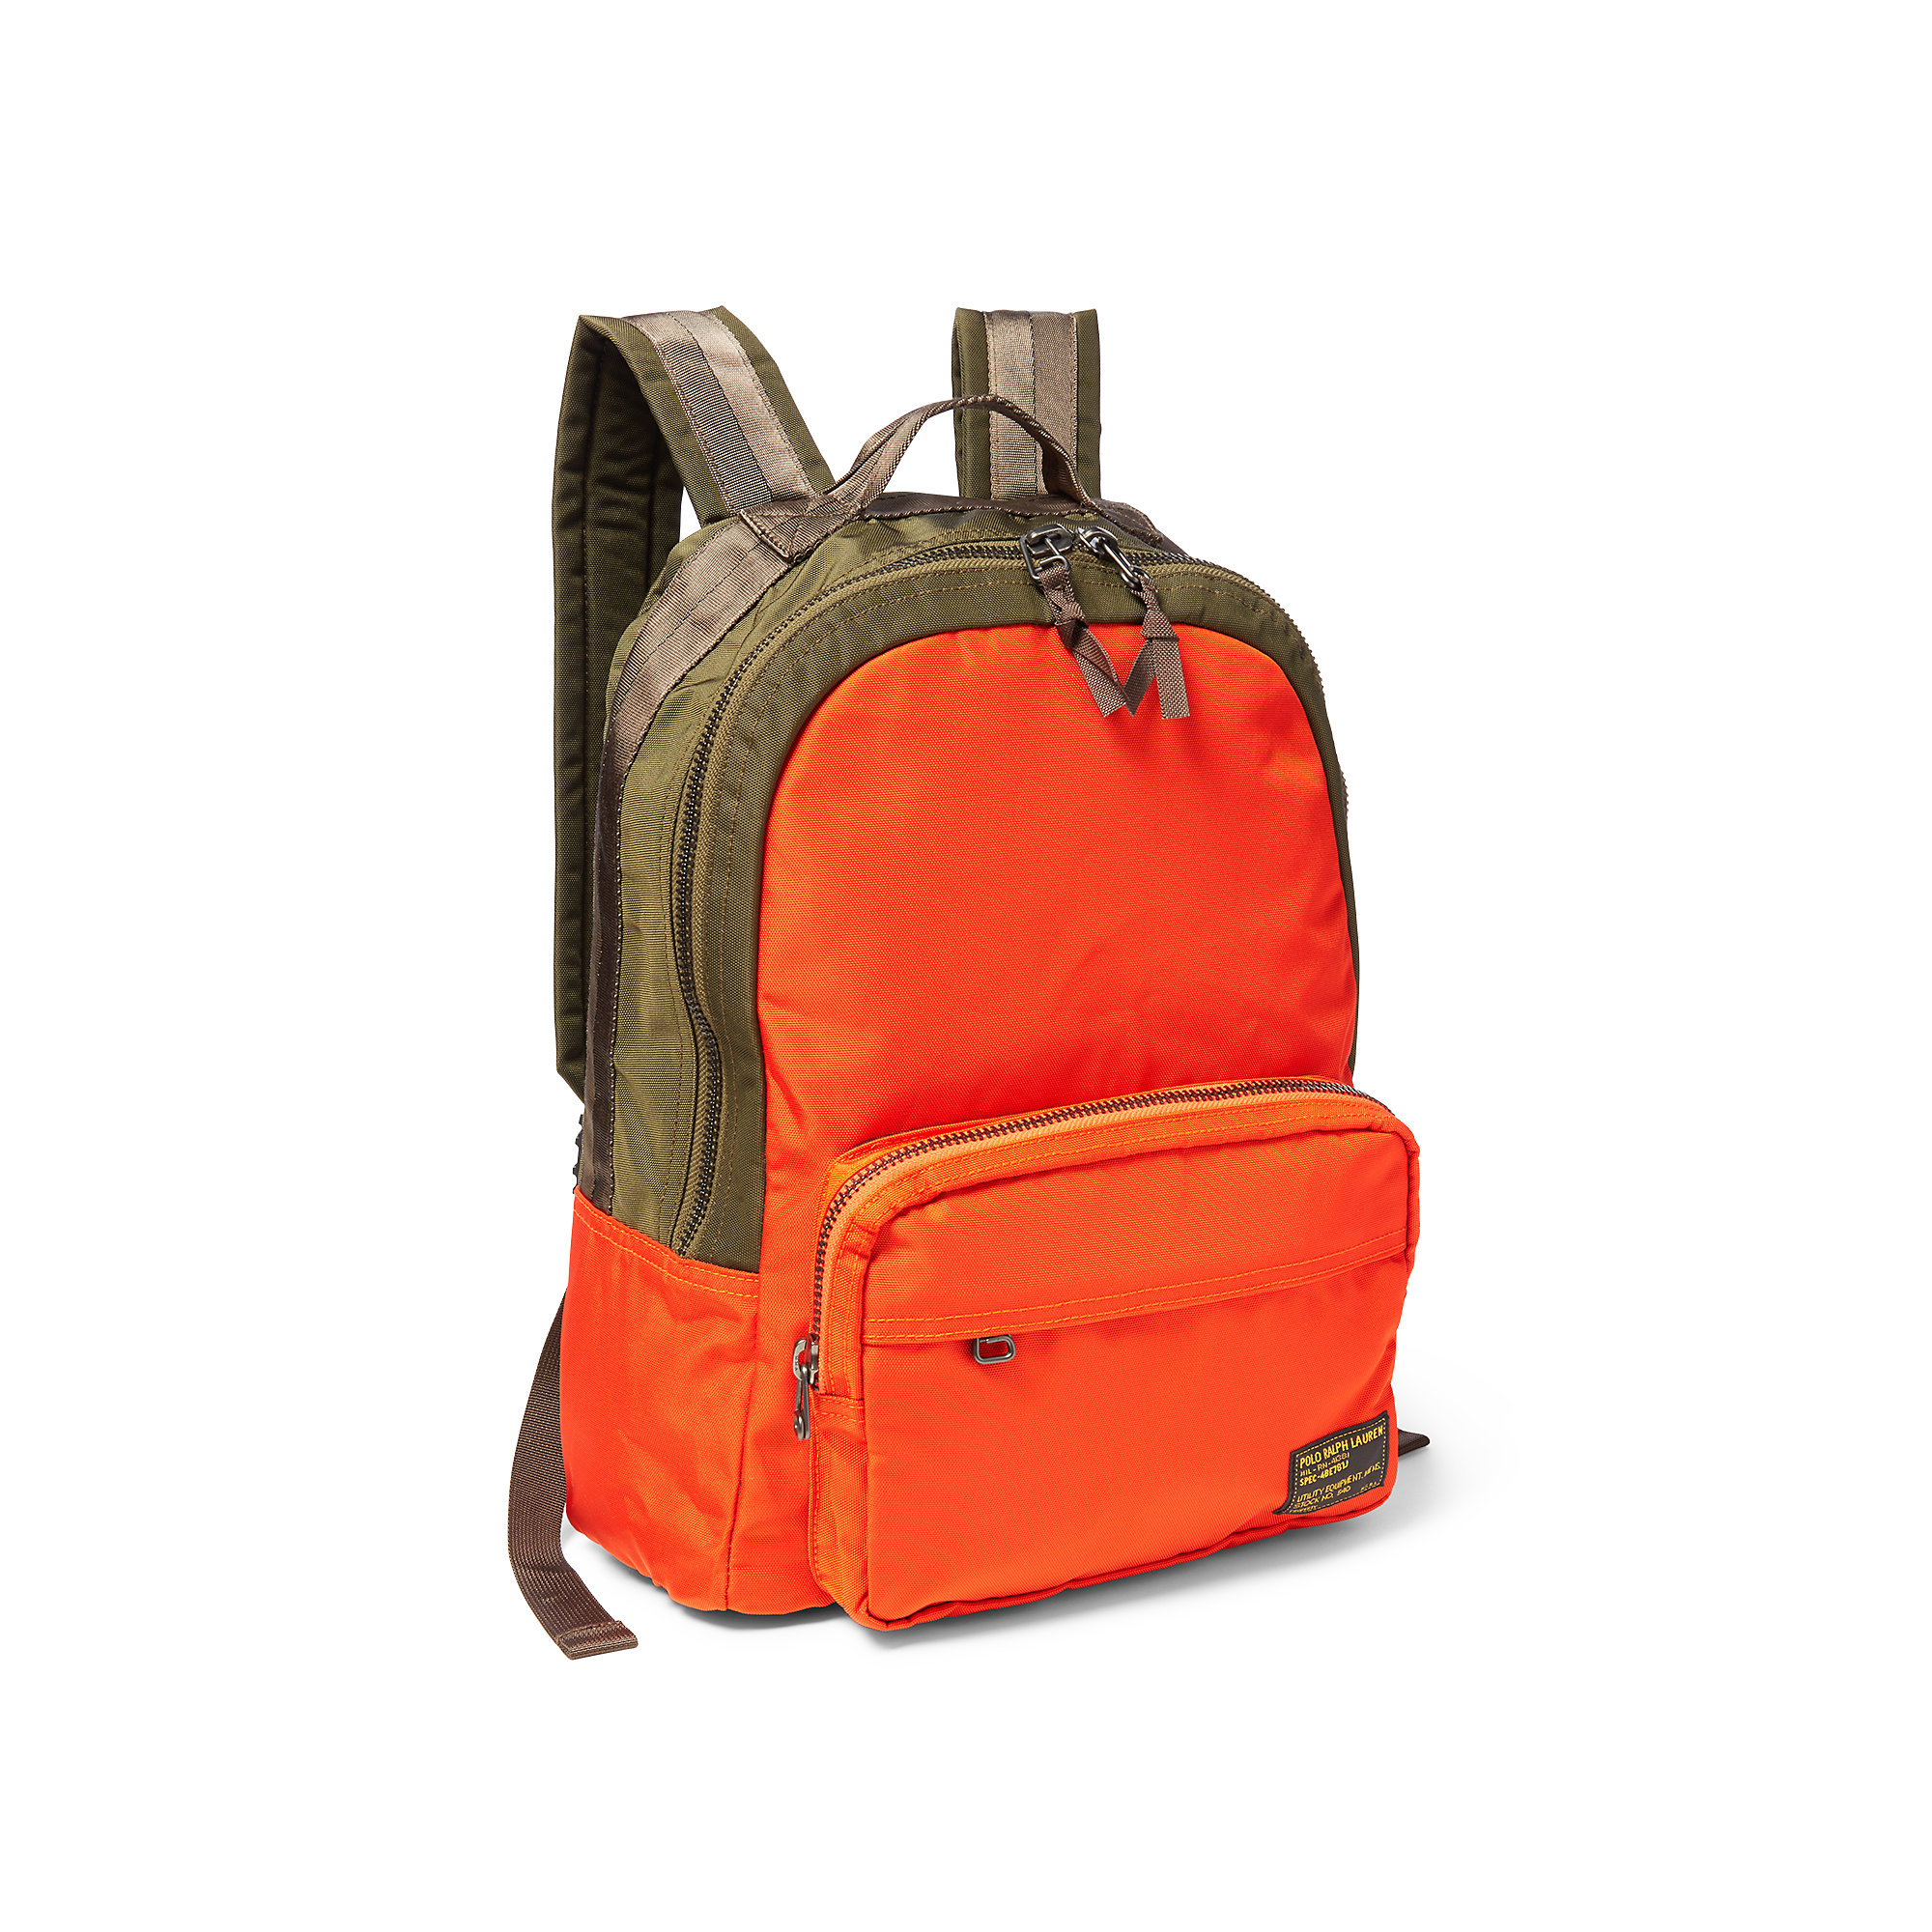 Lyst - Polo Ralph Lauren Military Nylon Dome Backpack in Green for Men 59d92cbe46f90